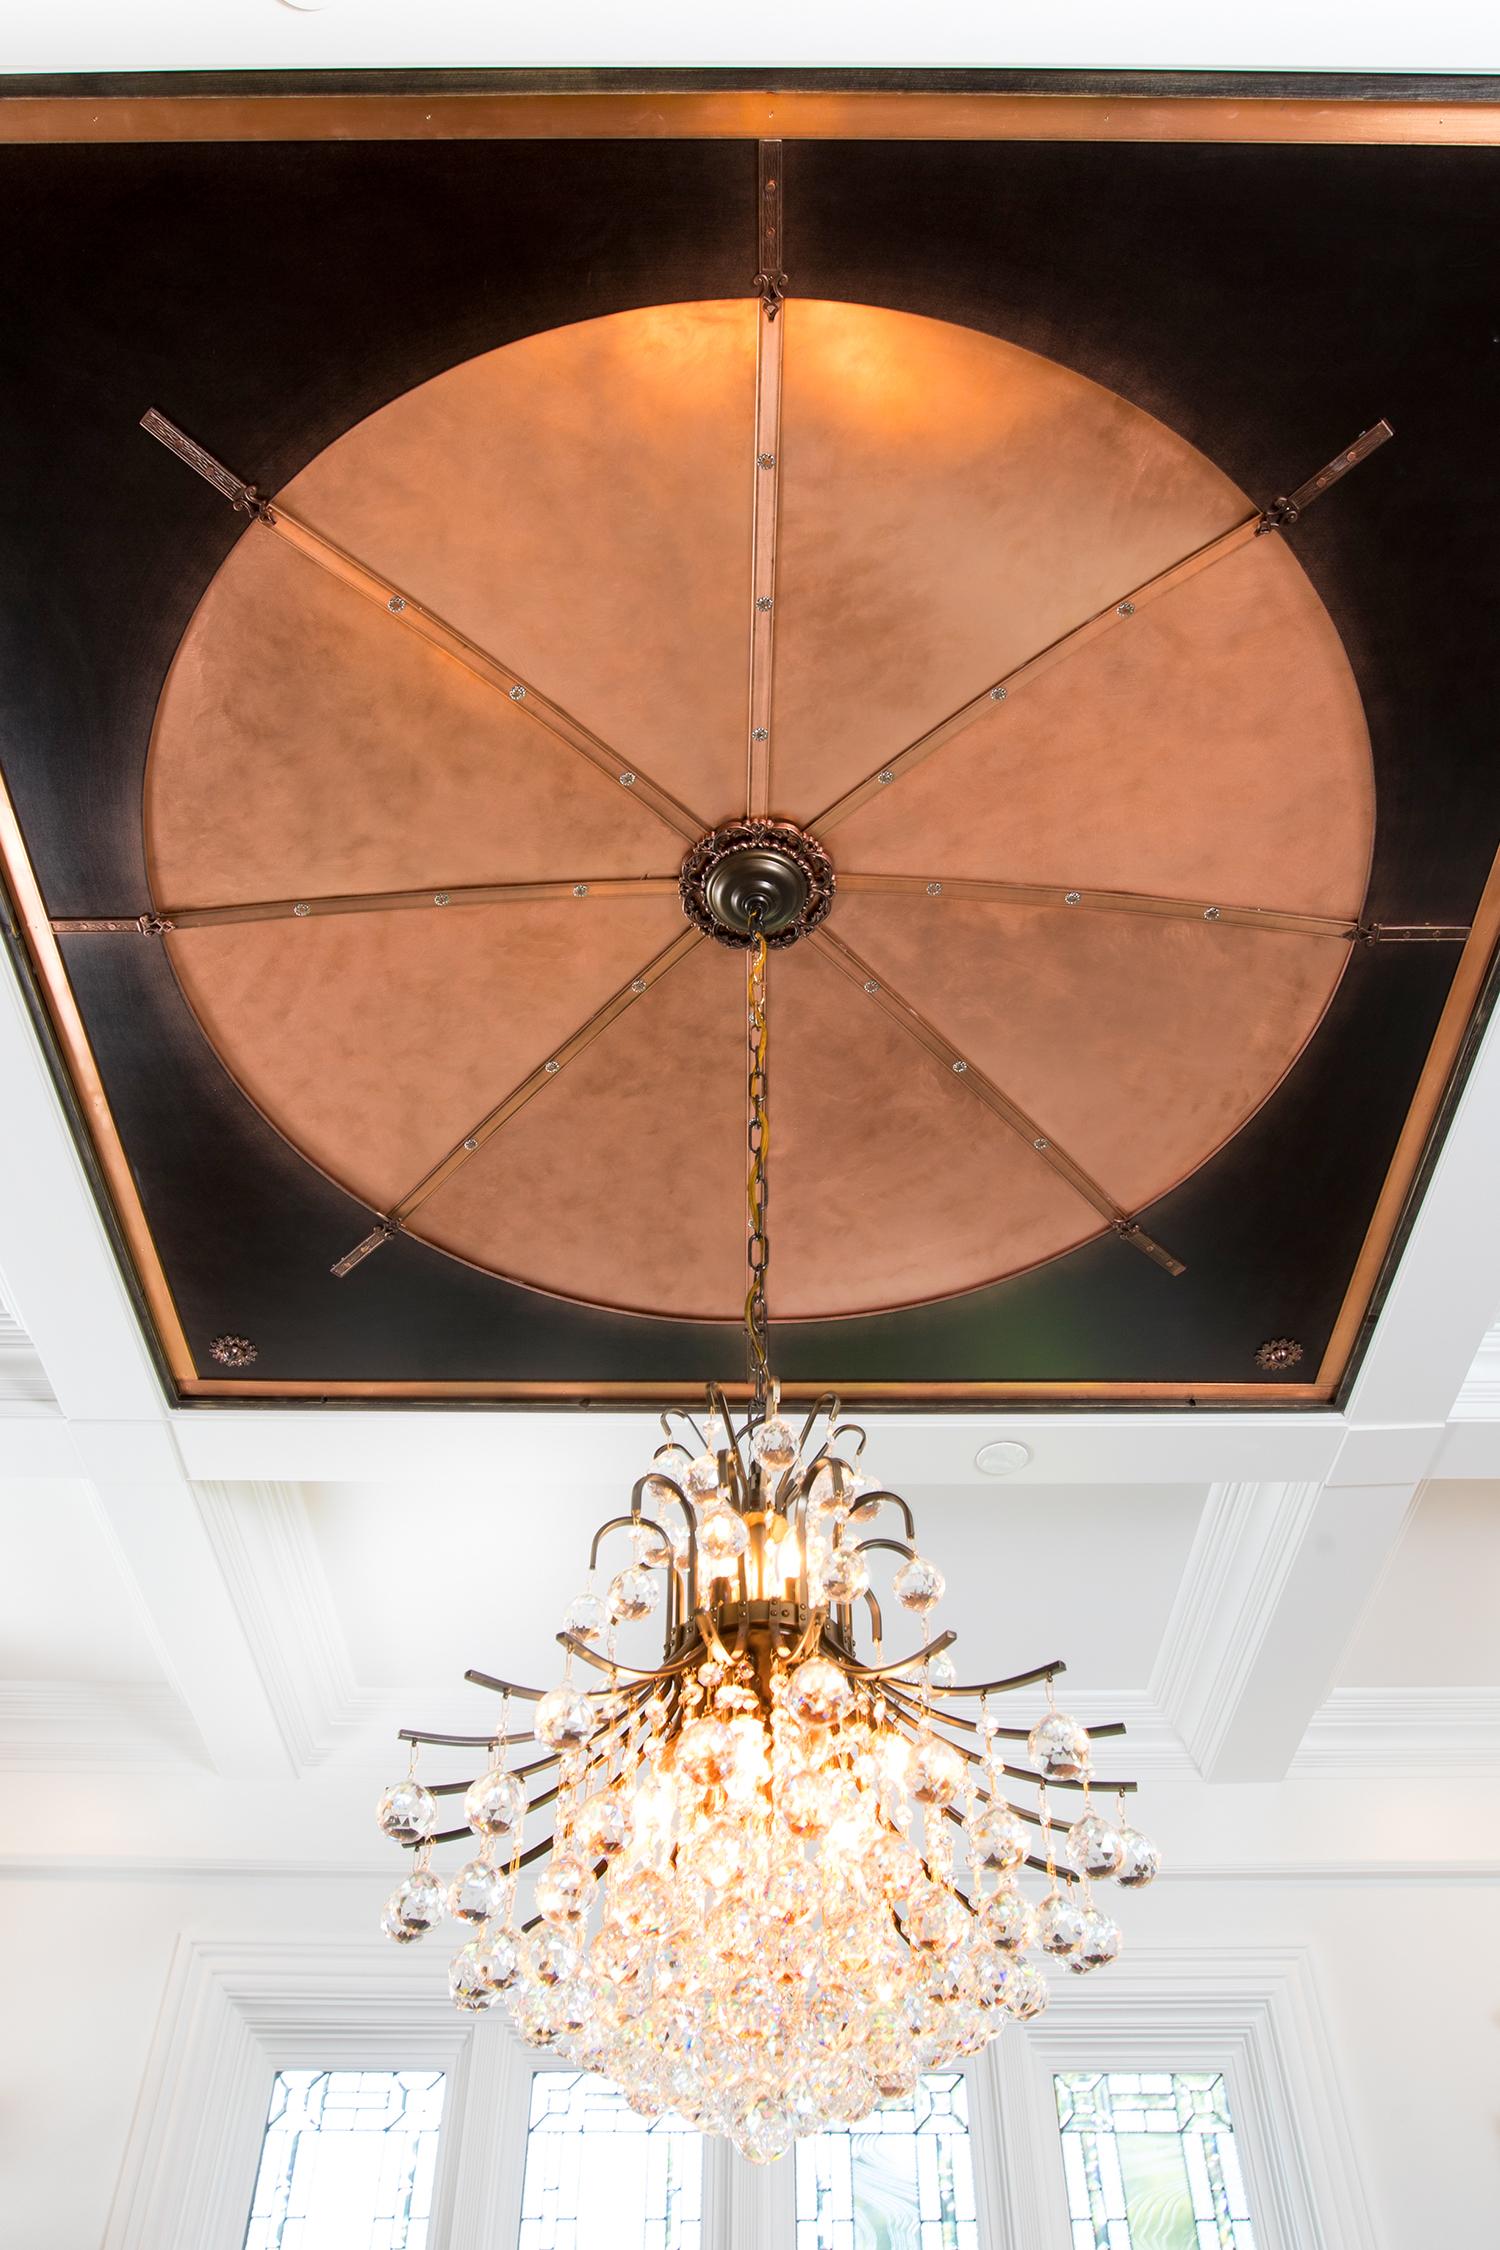 Farshad_ceiling2.jpg